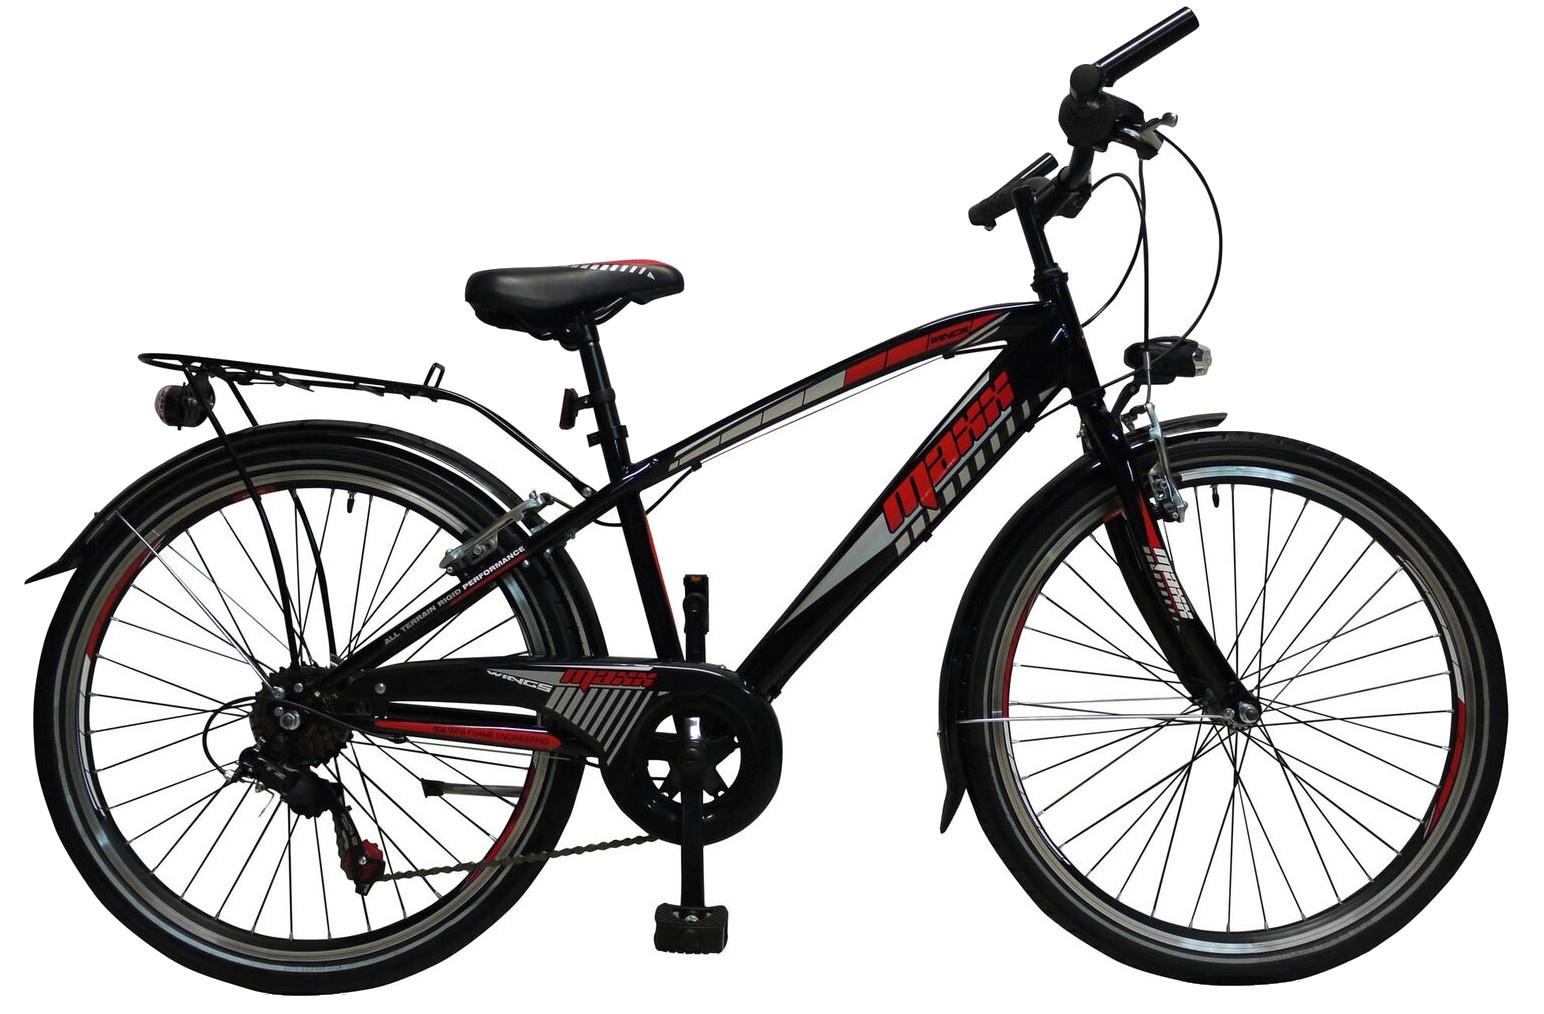 Wings Maxx 24 Inch Boys 6SP Rim Brakes Black - Internet-Bikes